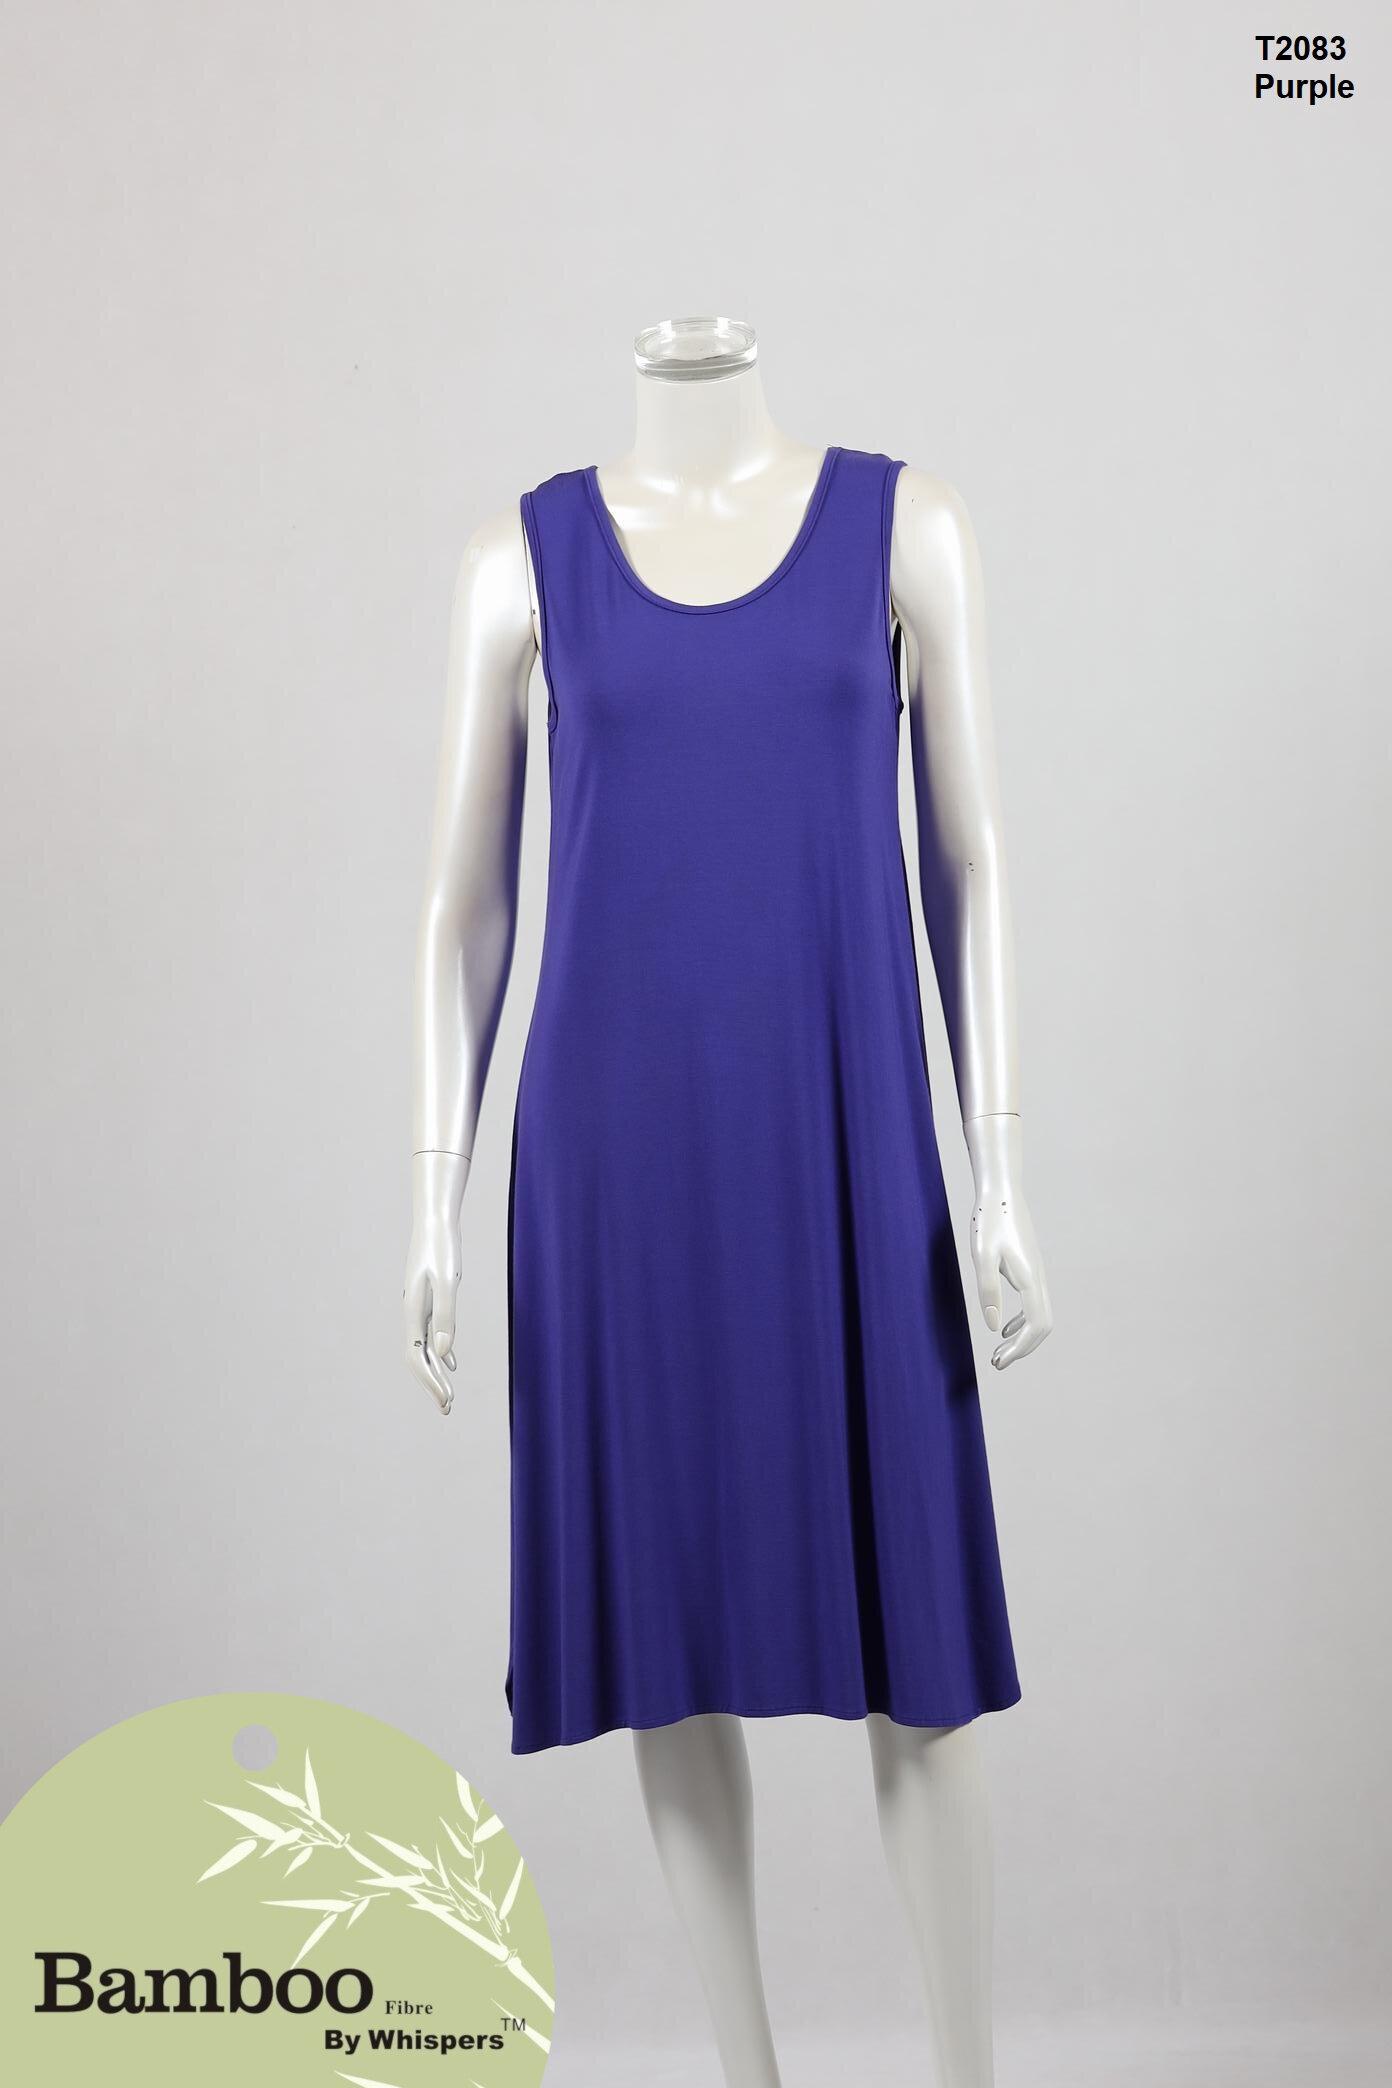 T2083-Bamboo Dress-Purple.JPG